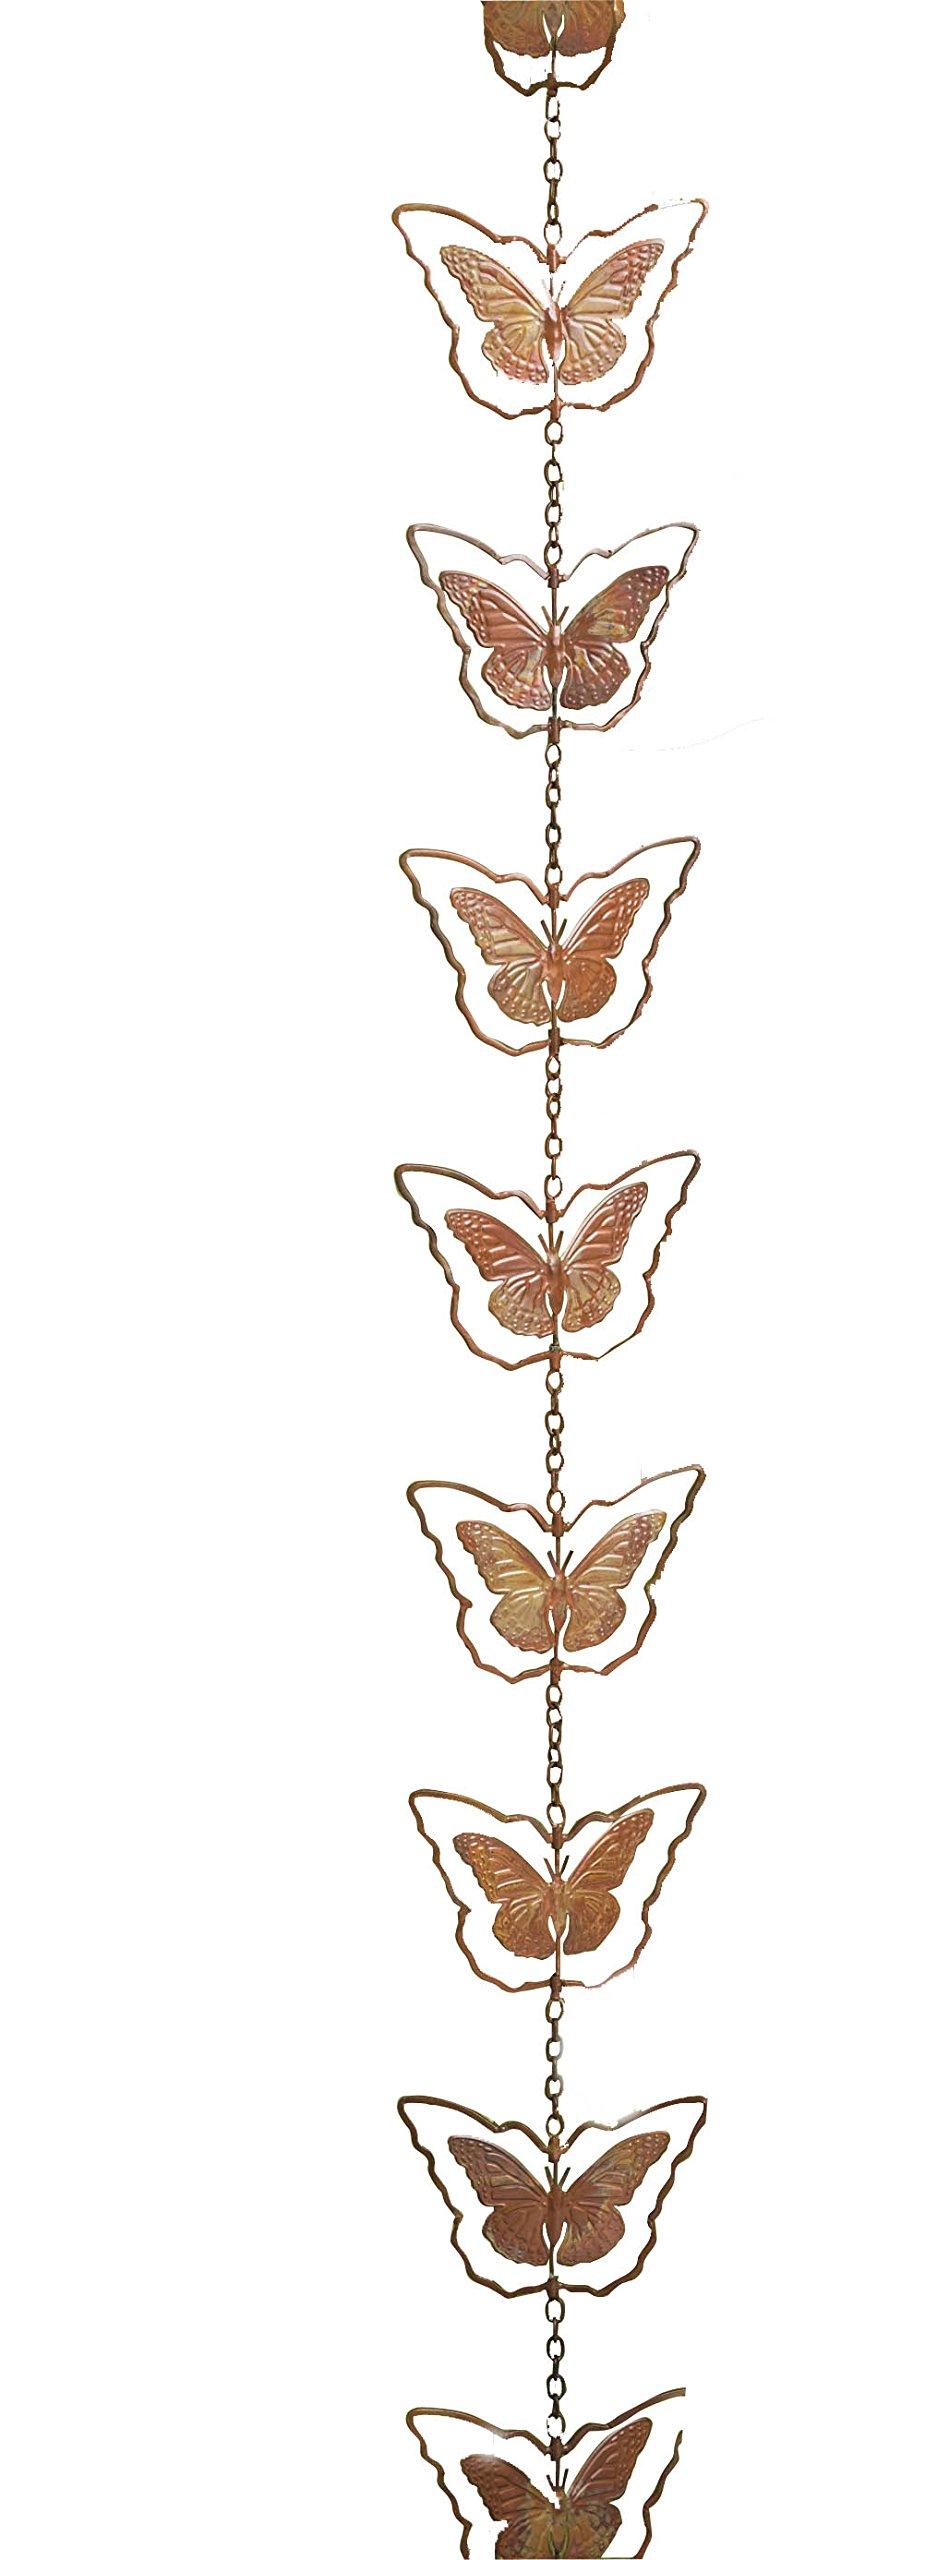 Ancient Graffiti Flamed Copper Butterfly Rain Chain, 5'' x 96'' x 5''